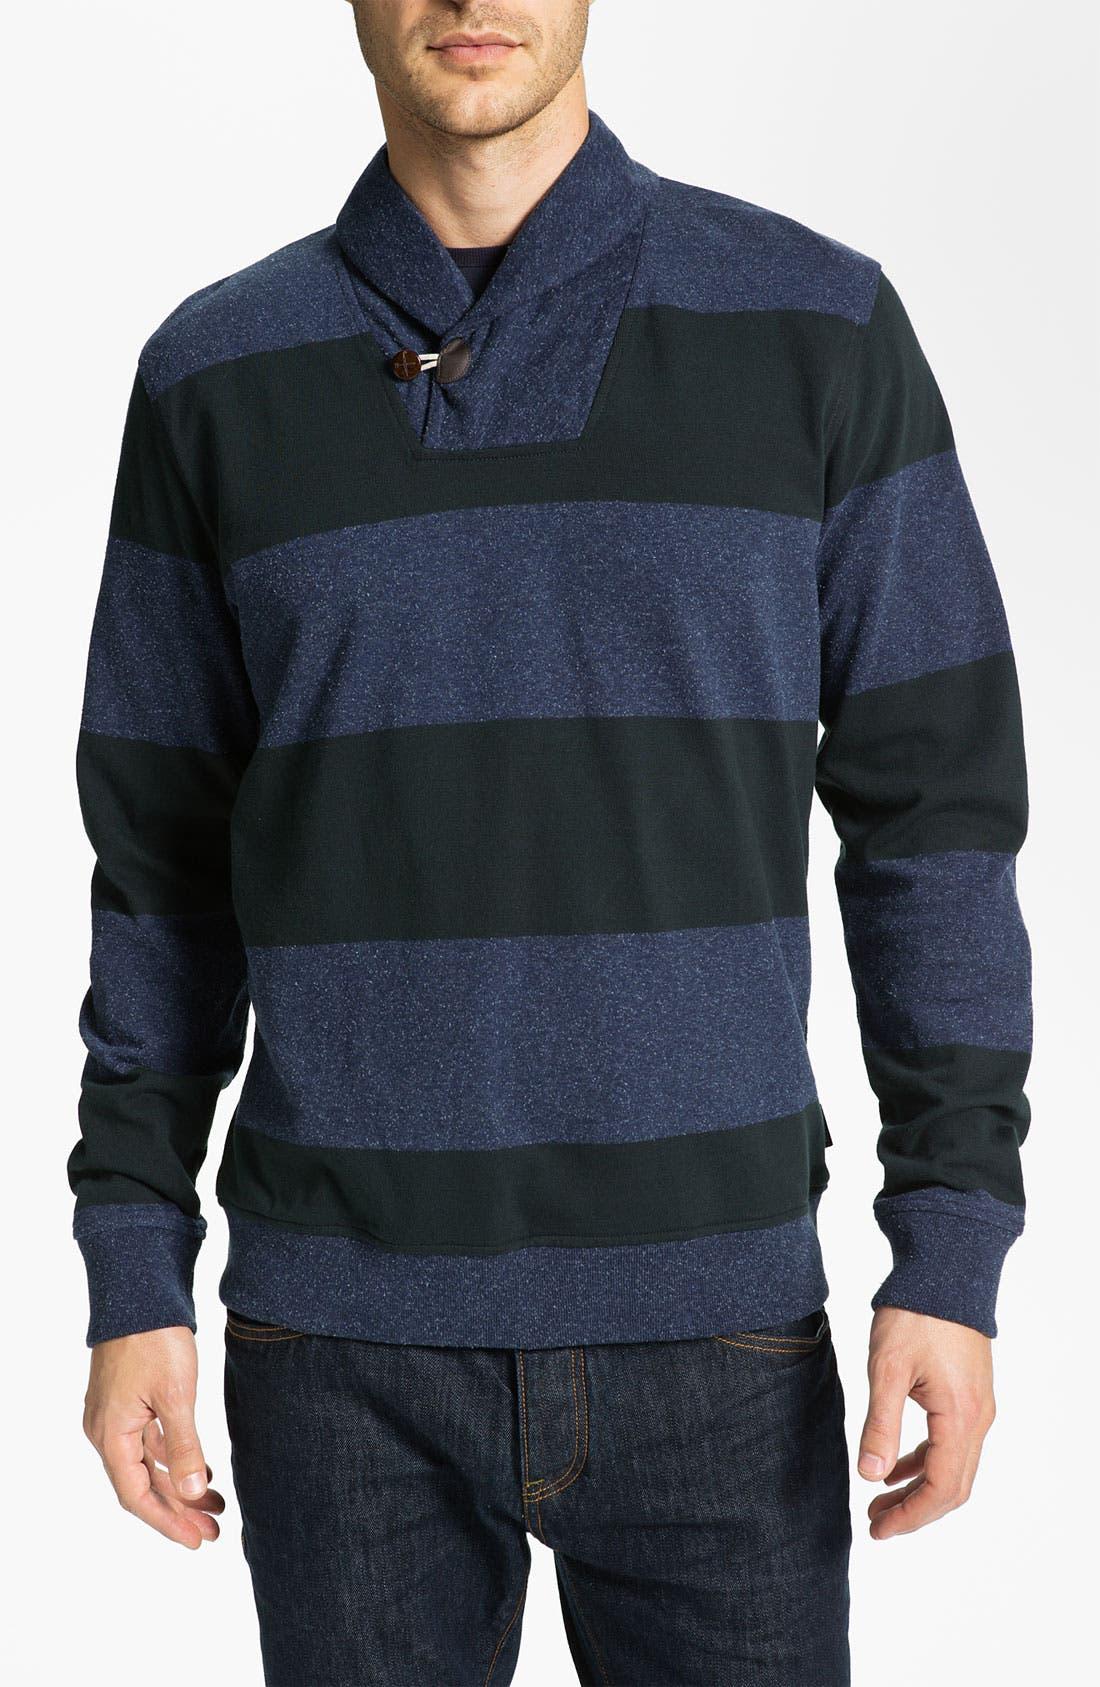 Alternate Image 1 Selected - Ted Baker London 'Nepjack' Shawl Collar Top